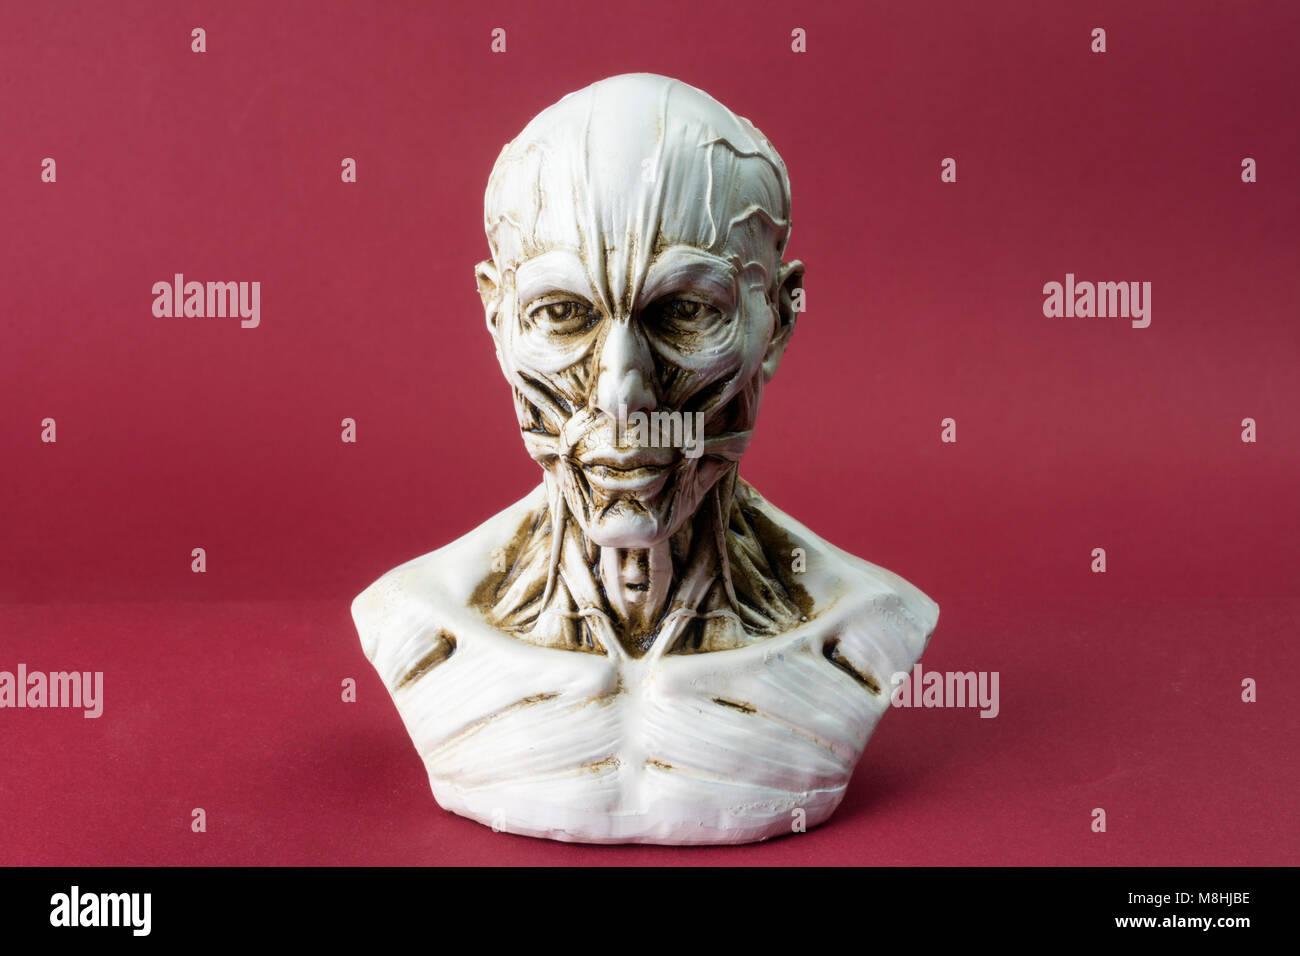 Anatomical bust - Stock Image